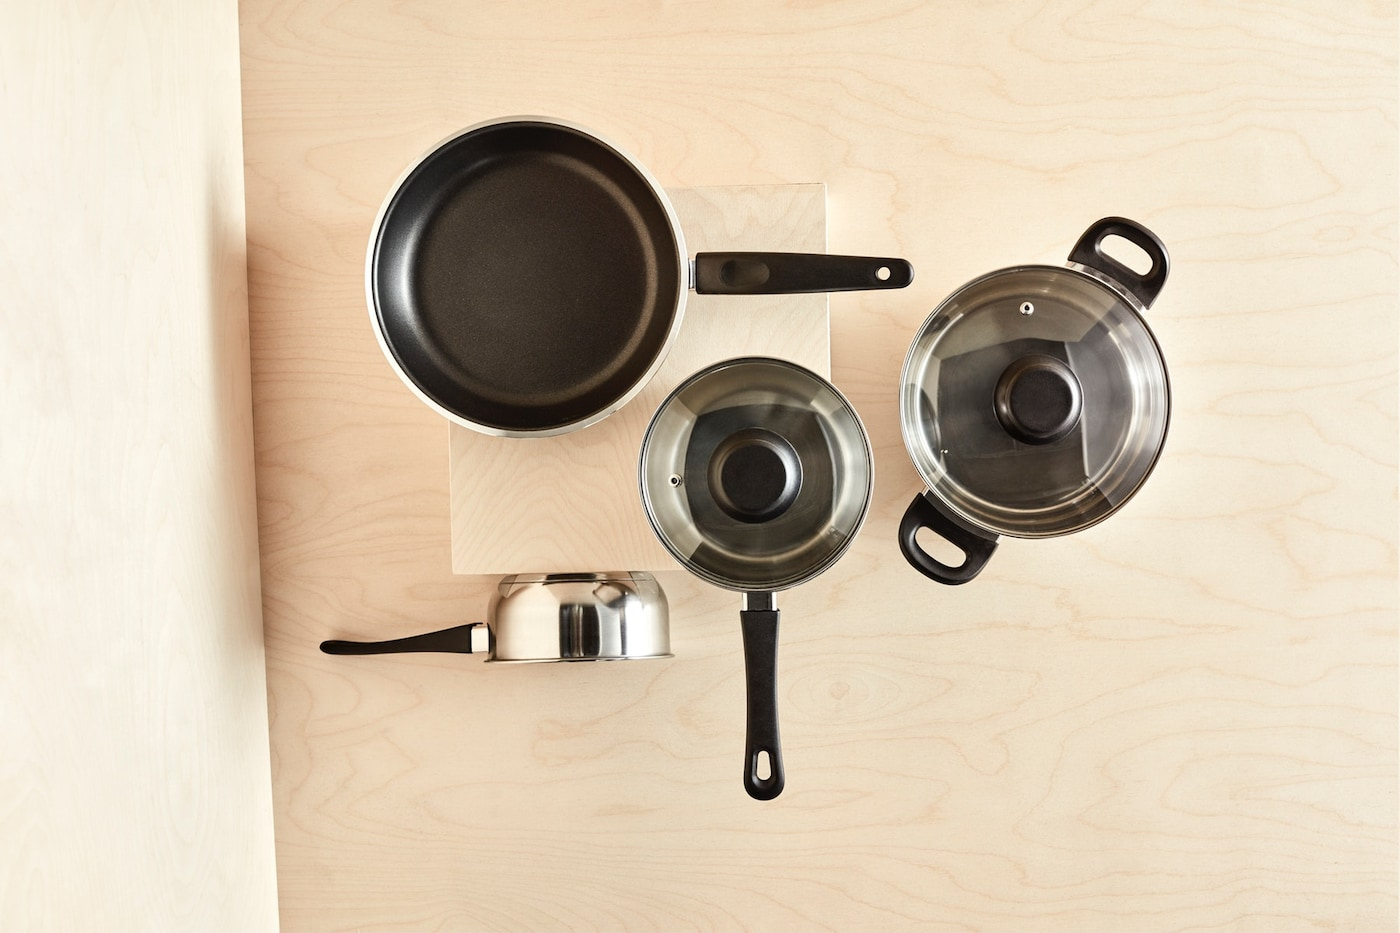 batterie cuisine